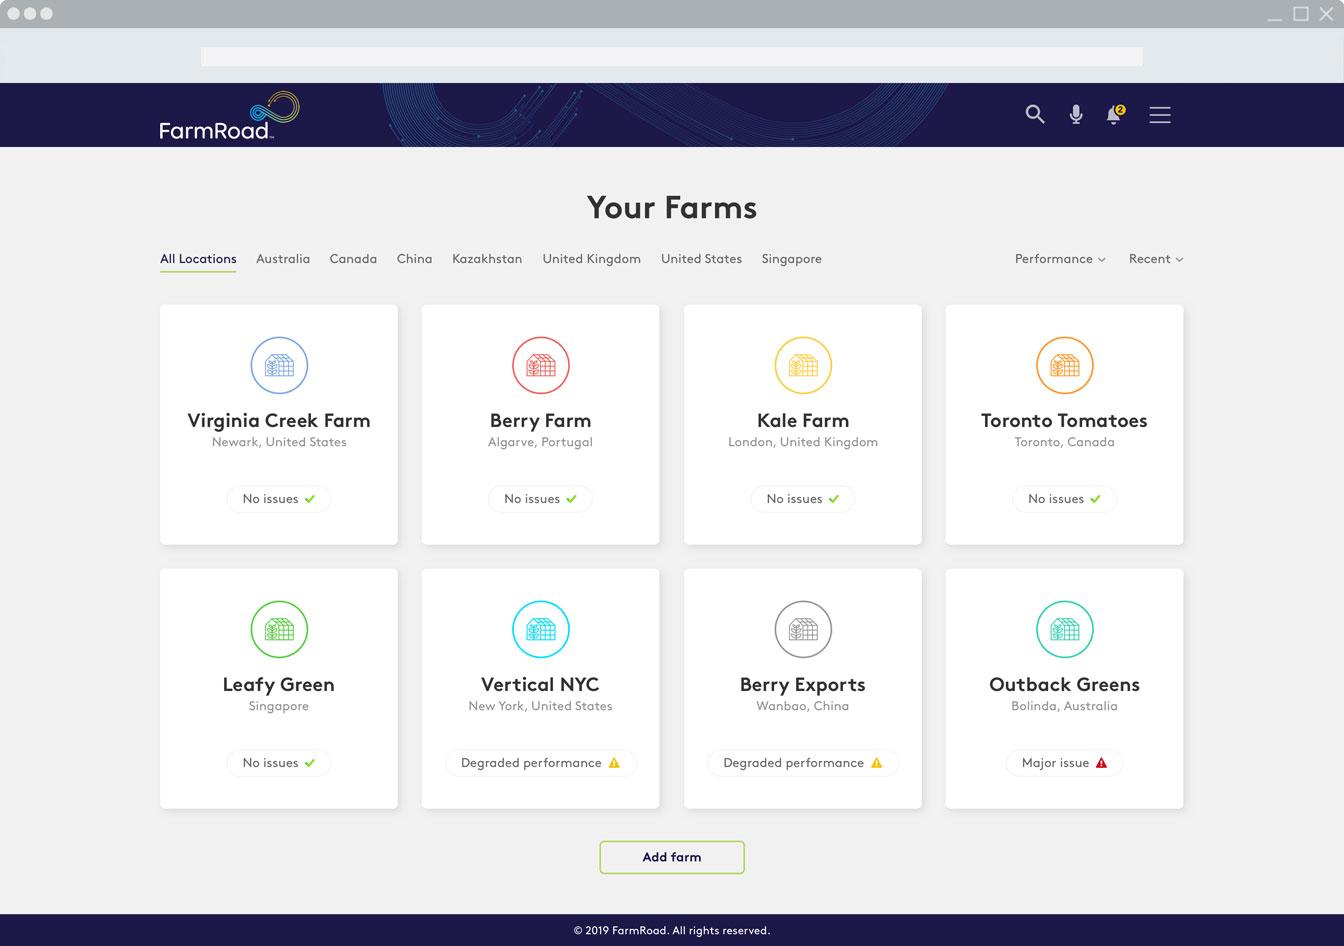 FarmRoad farm management software